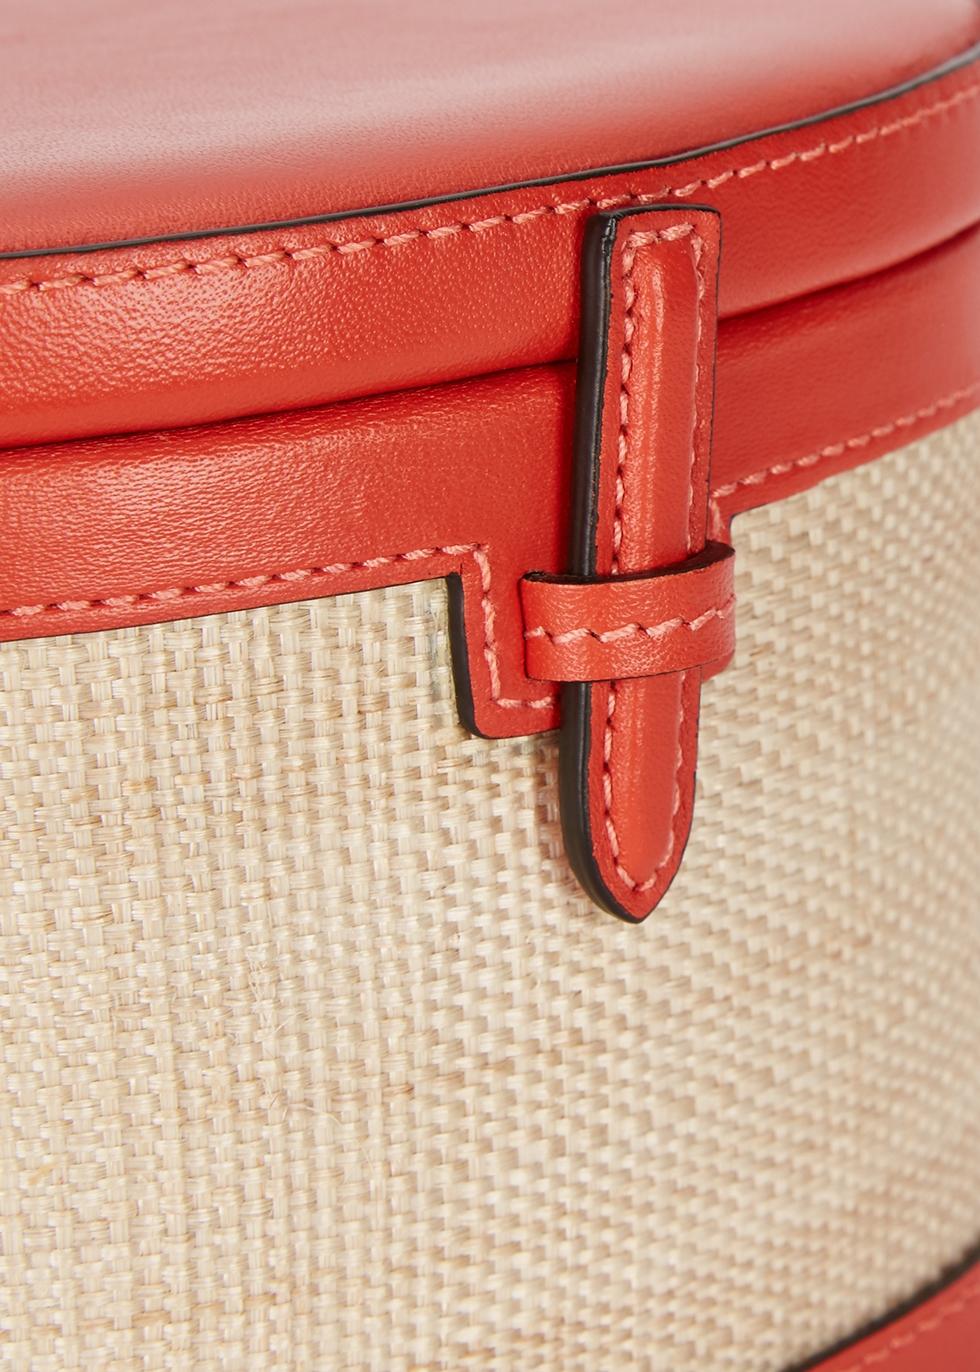 Red leather bucket bag - Hunting Season